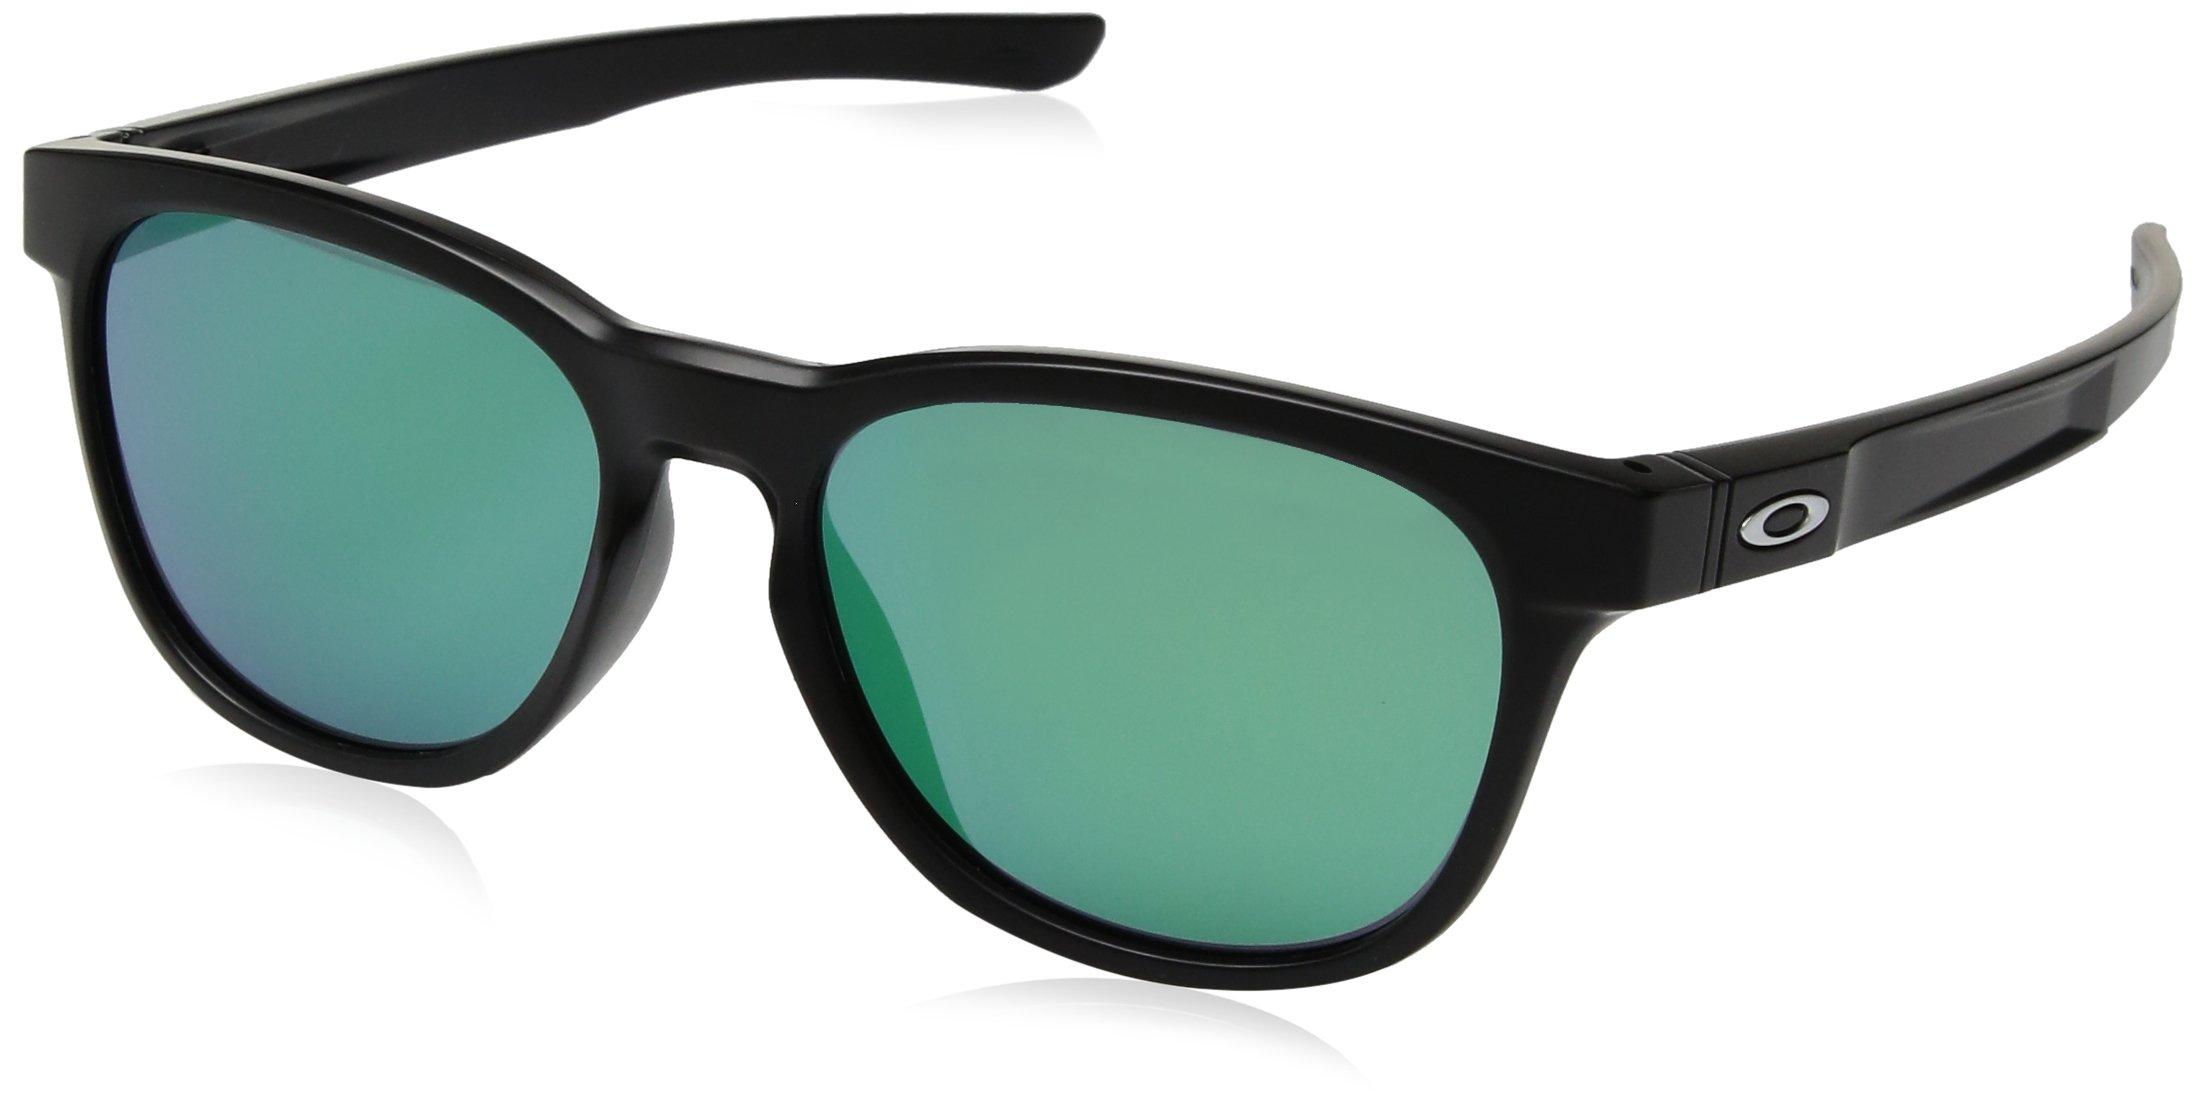 Oakley Stringer Sunglasses Matte Black/Jade